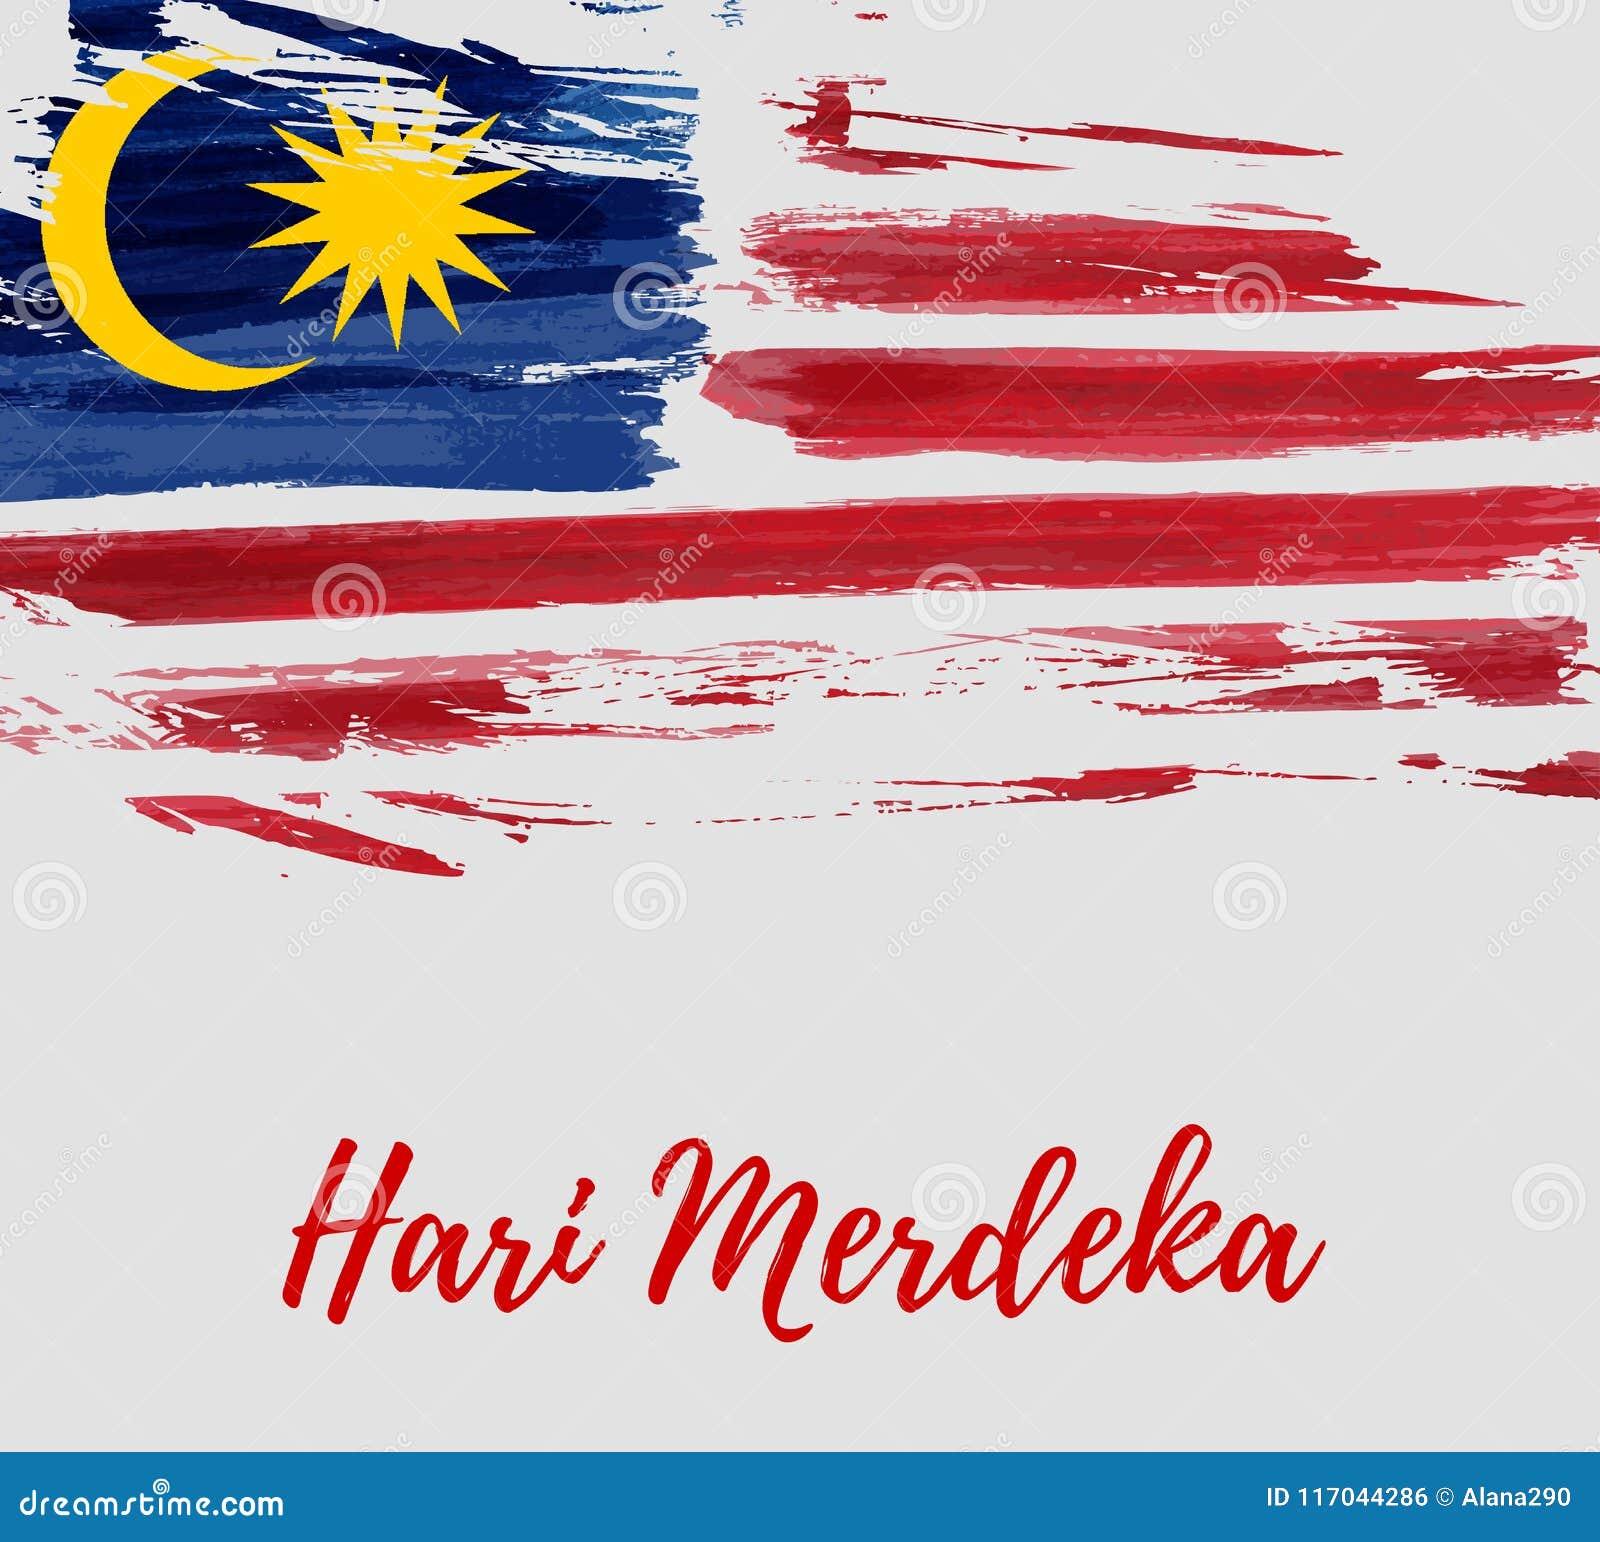 Malaysia självständighetsdagen - Hari Merdeka ferie